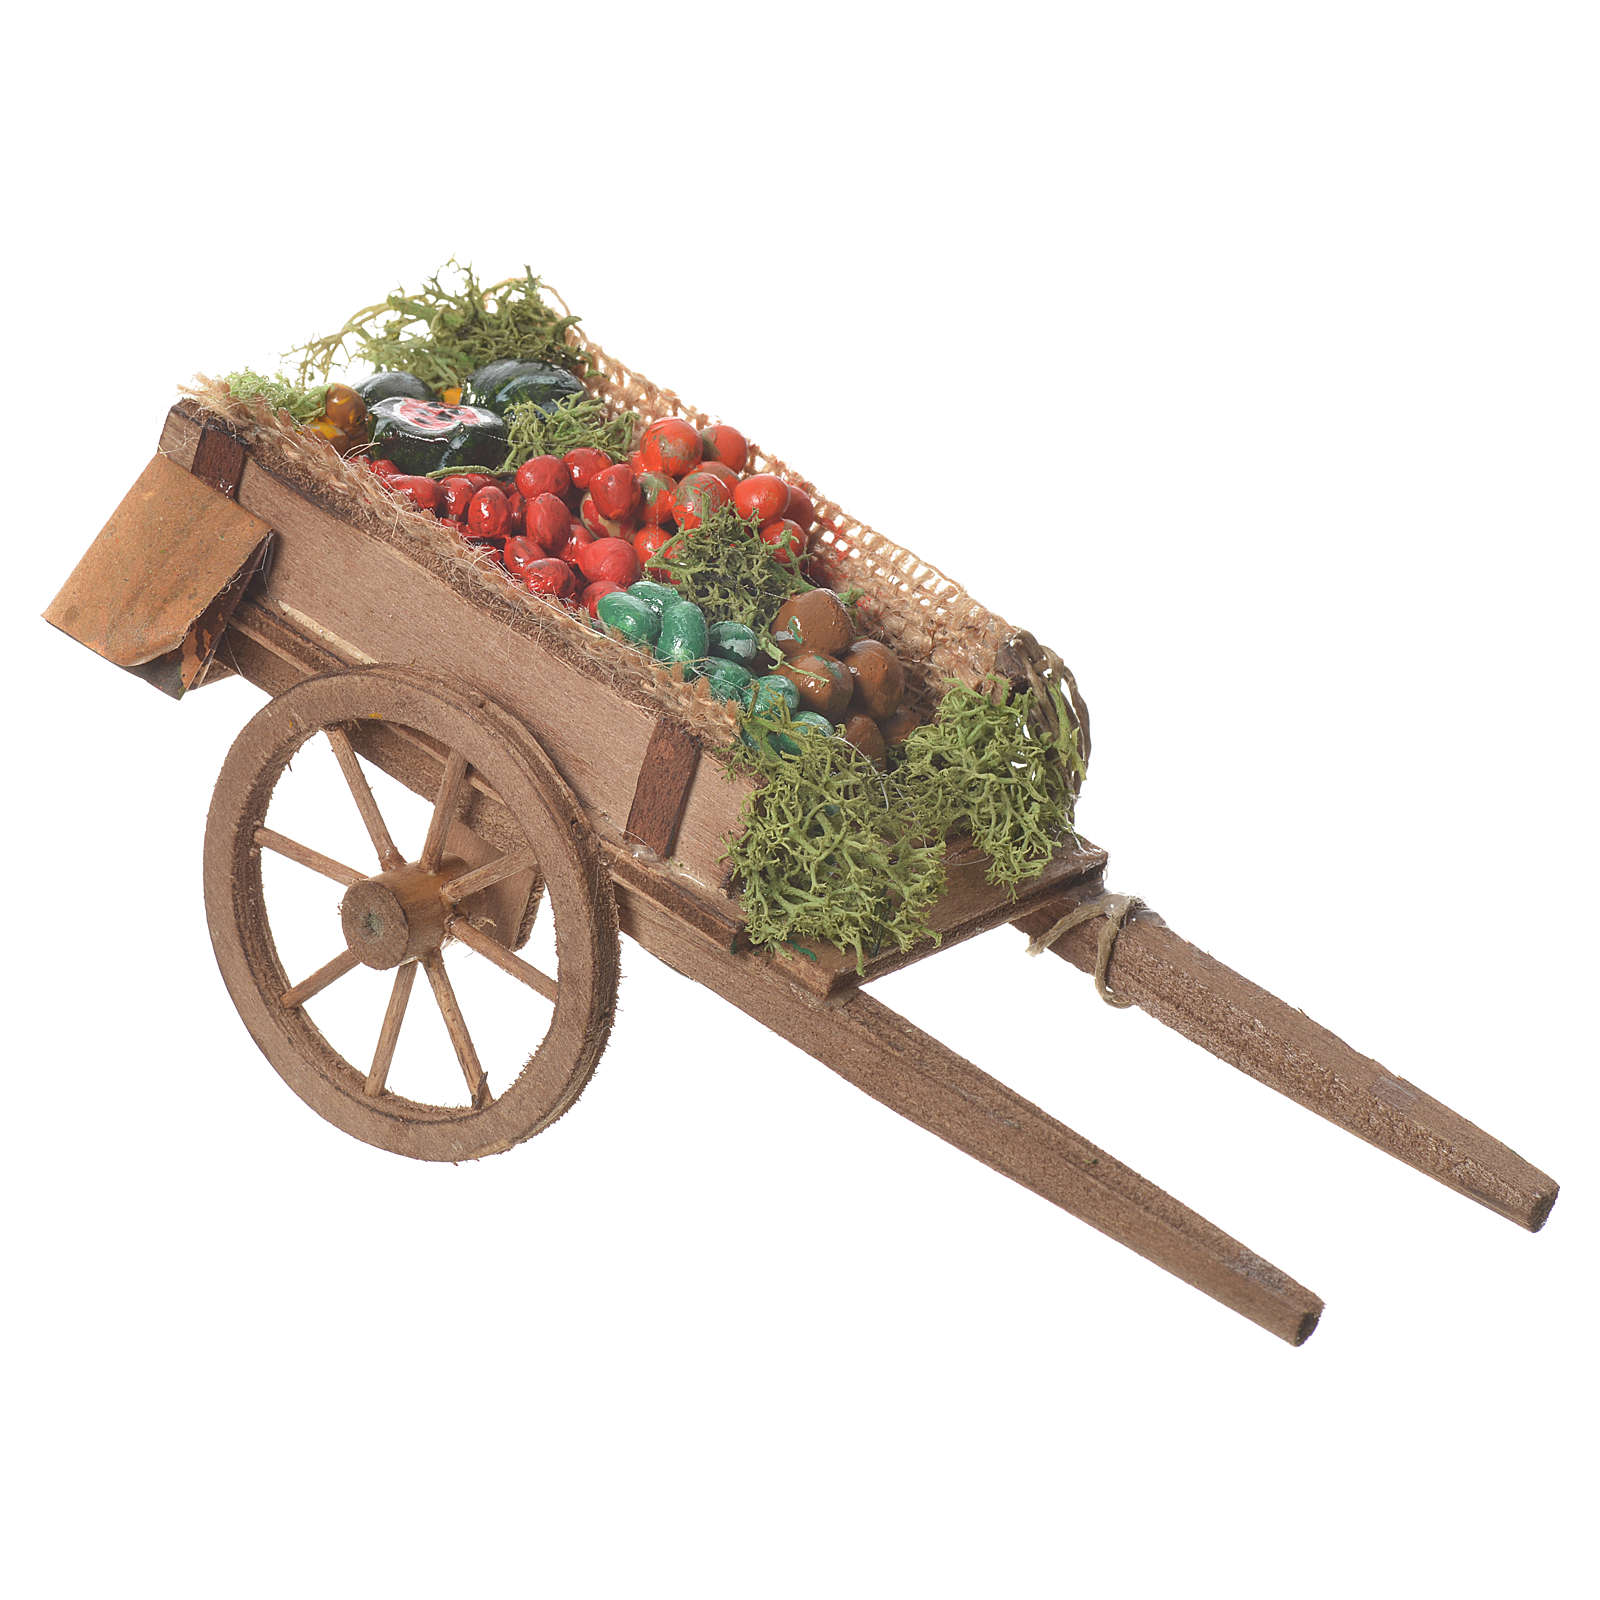 Carro de fruta pesebre napolitano 18x6 cm 4